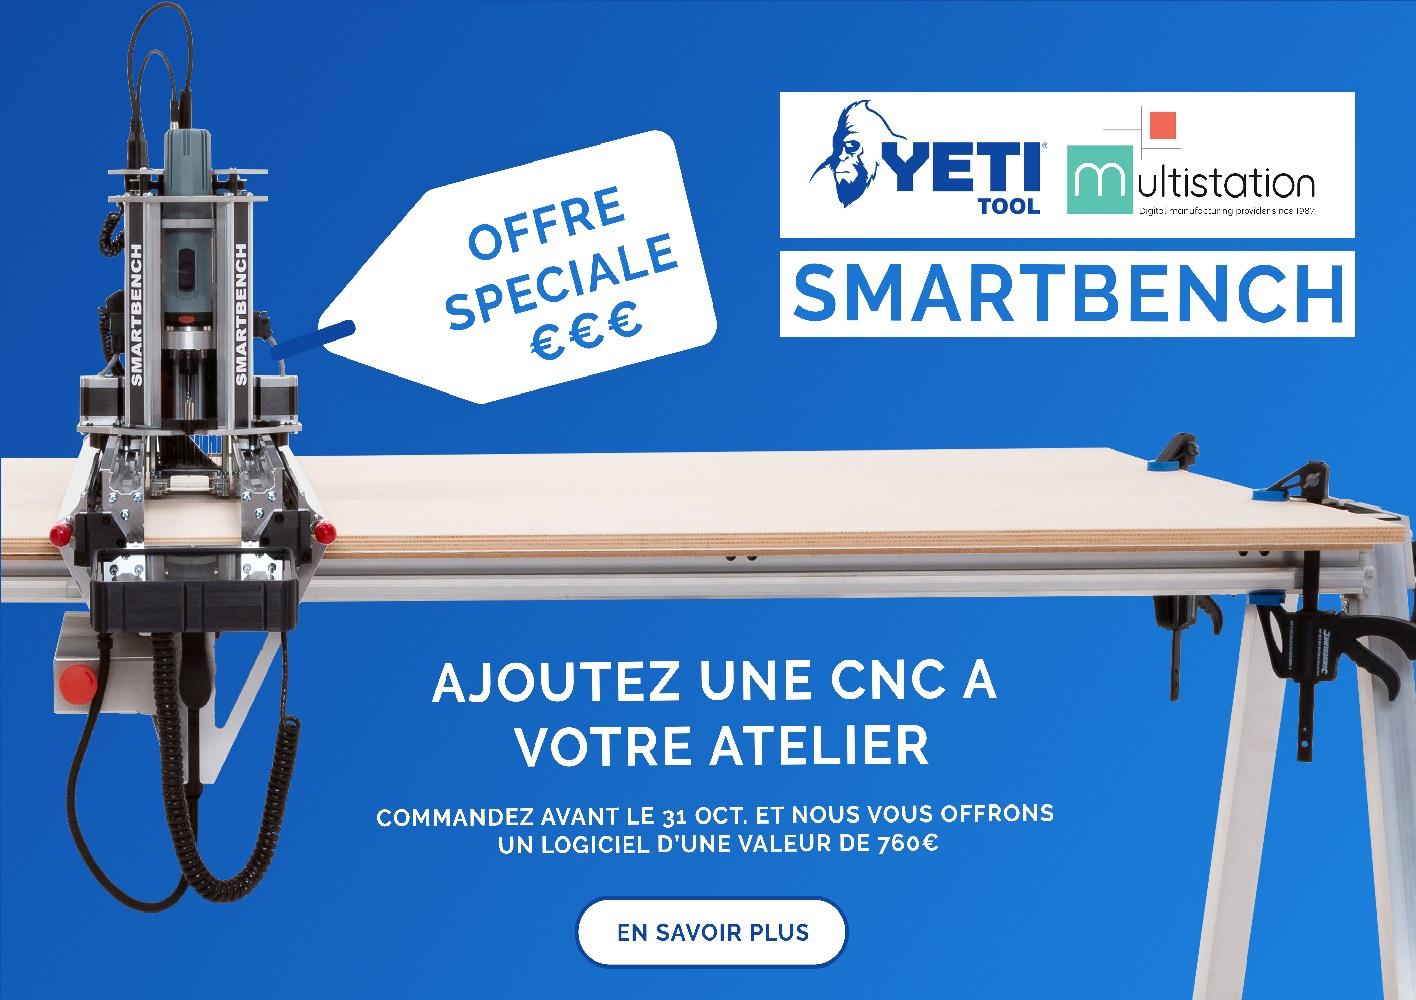 SmartBenchSMSpecialOfferFranceDraft